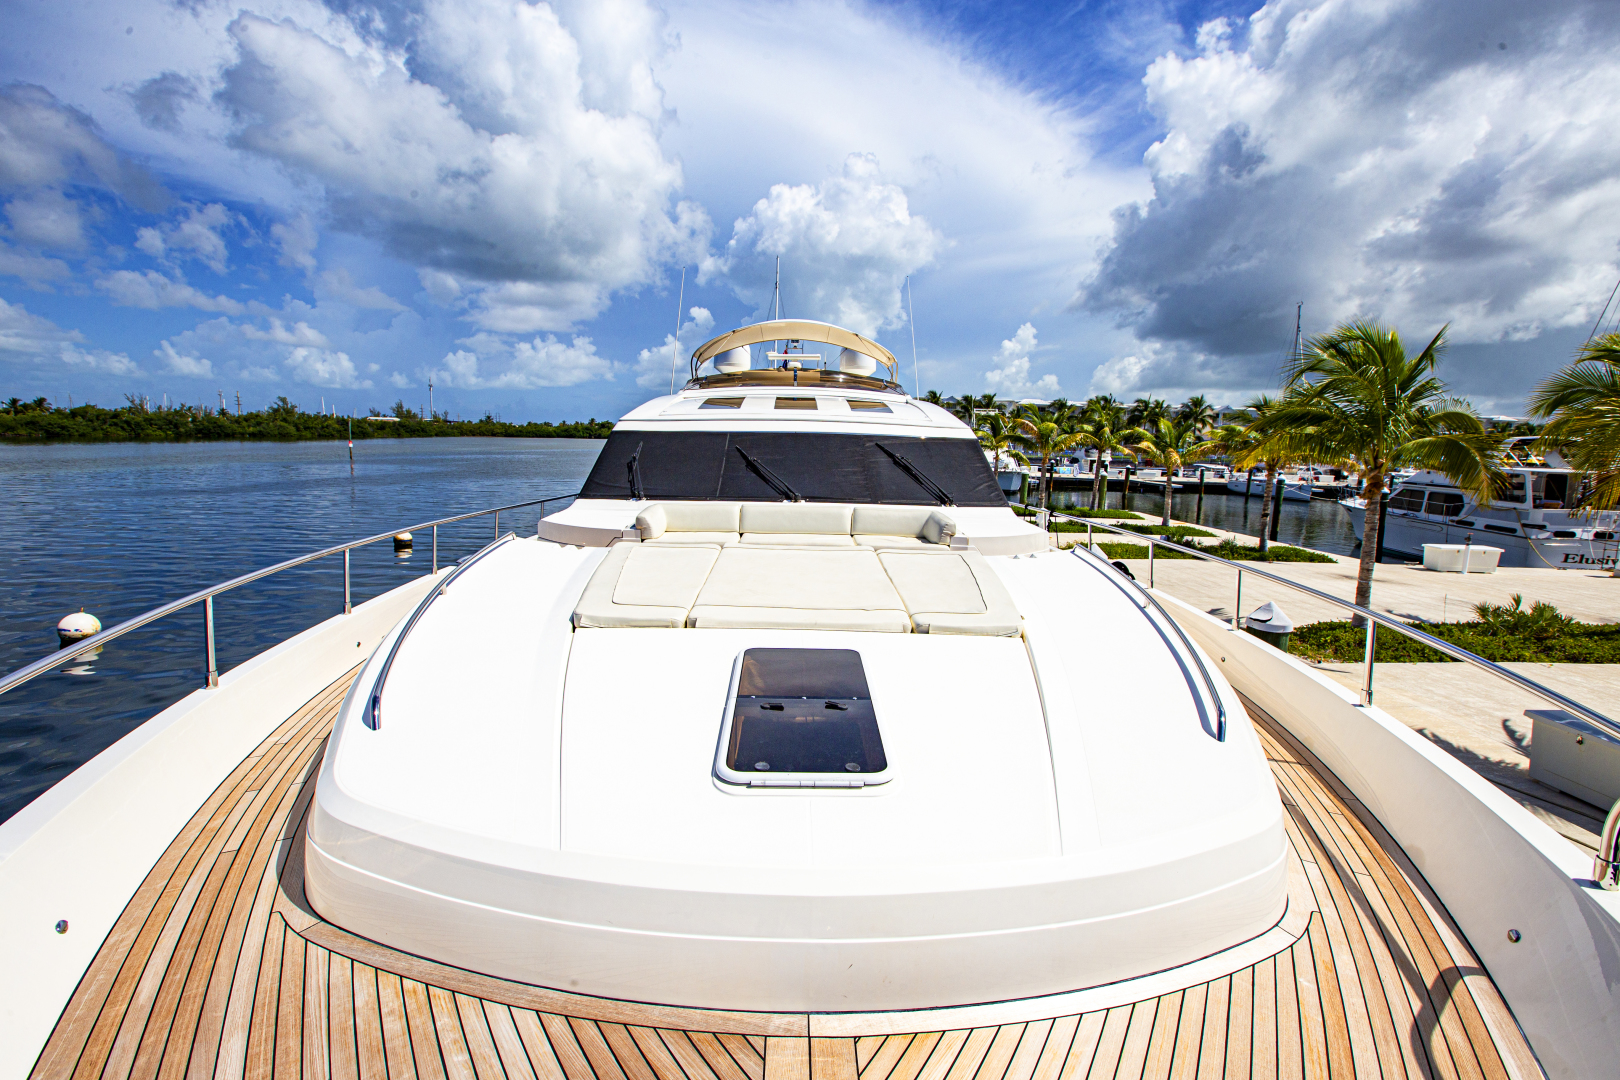 Viking Princess-V85 2009-Las Brisas Fort Lauderdale-Florida-United States-1365522 | Thumbnail